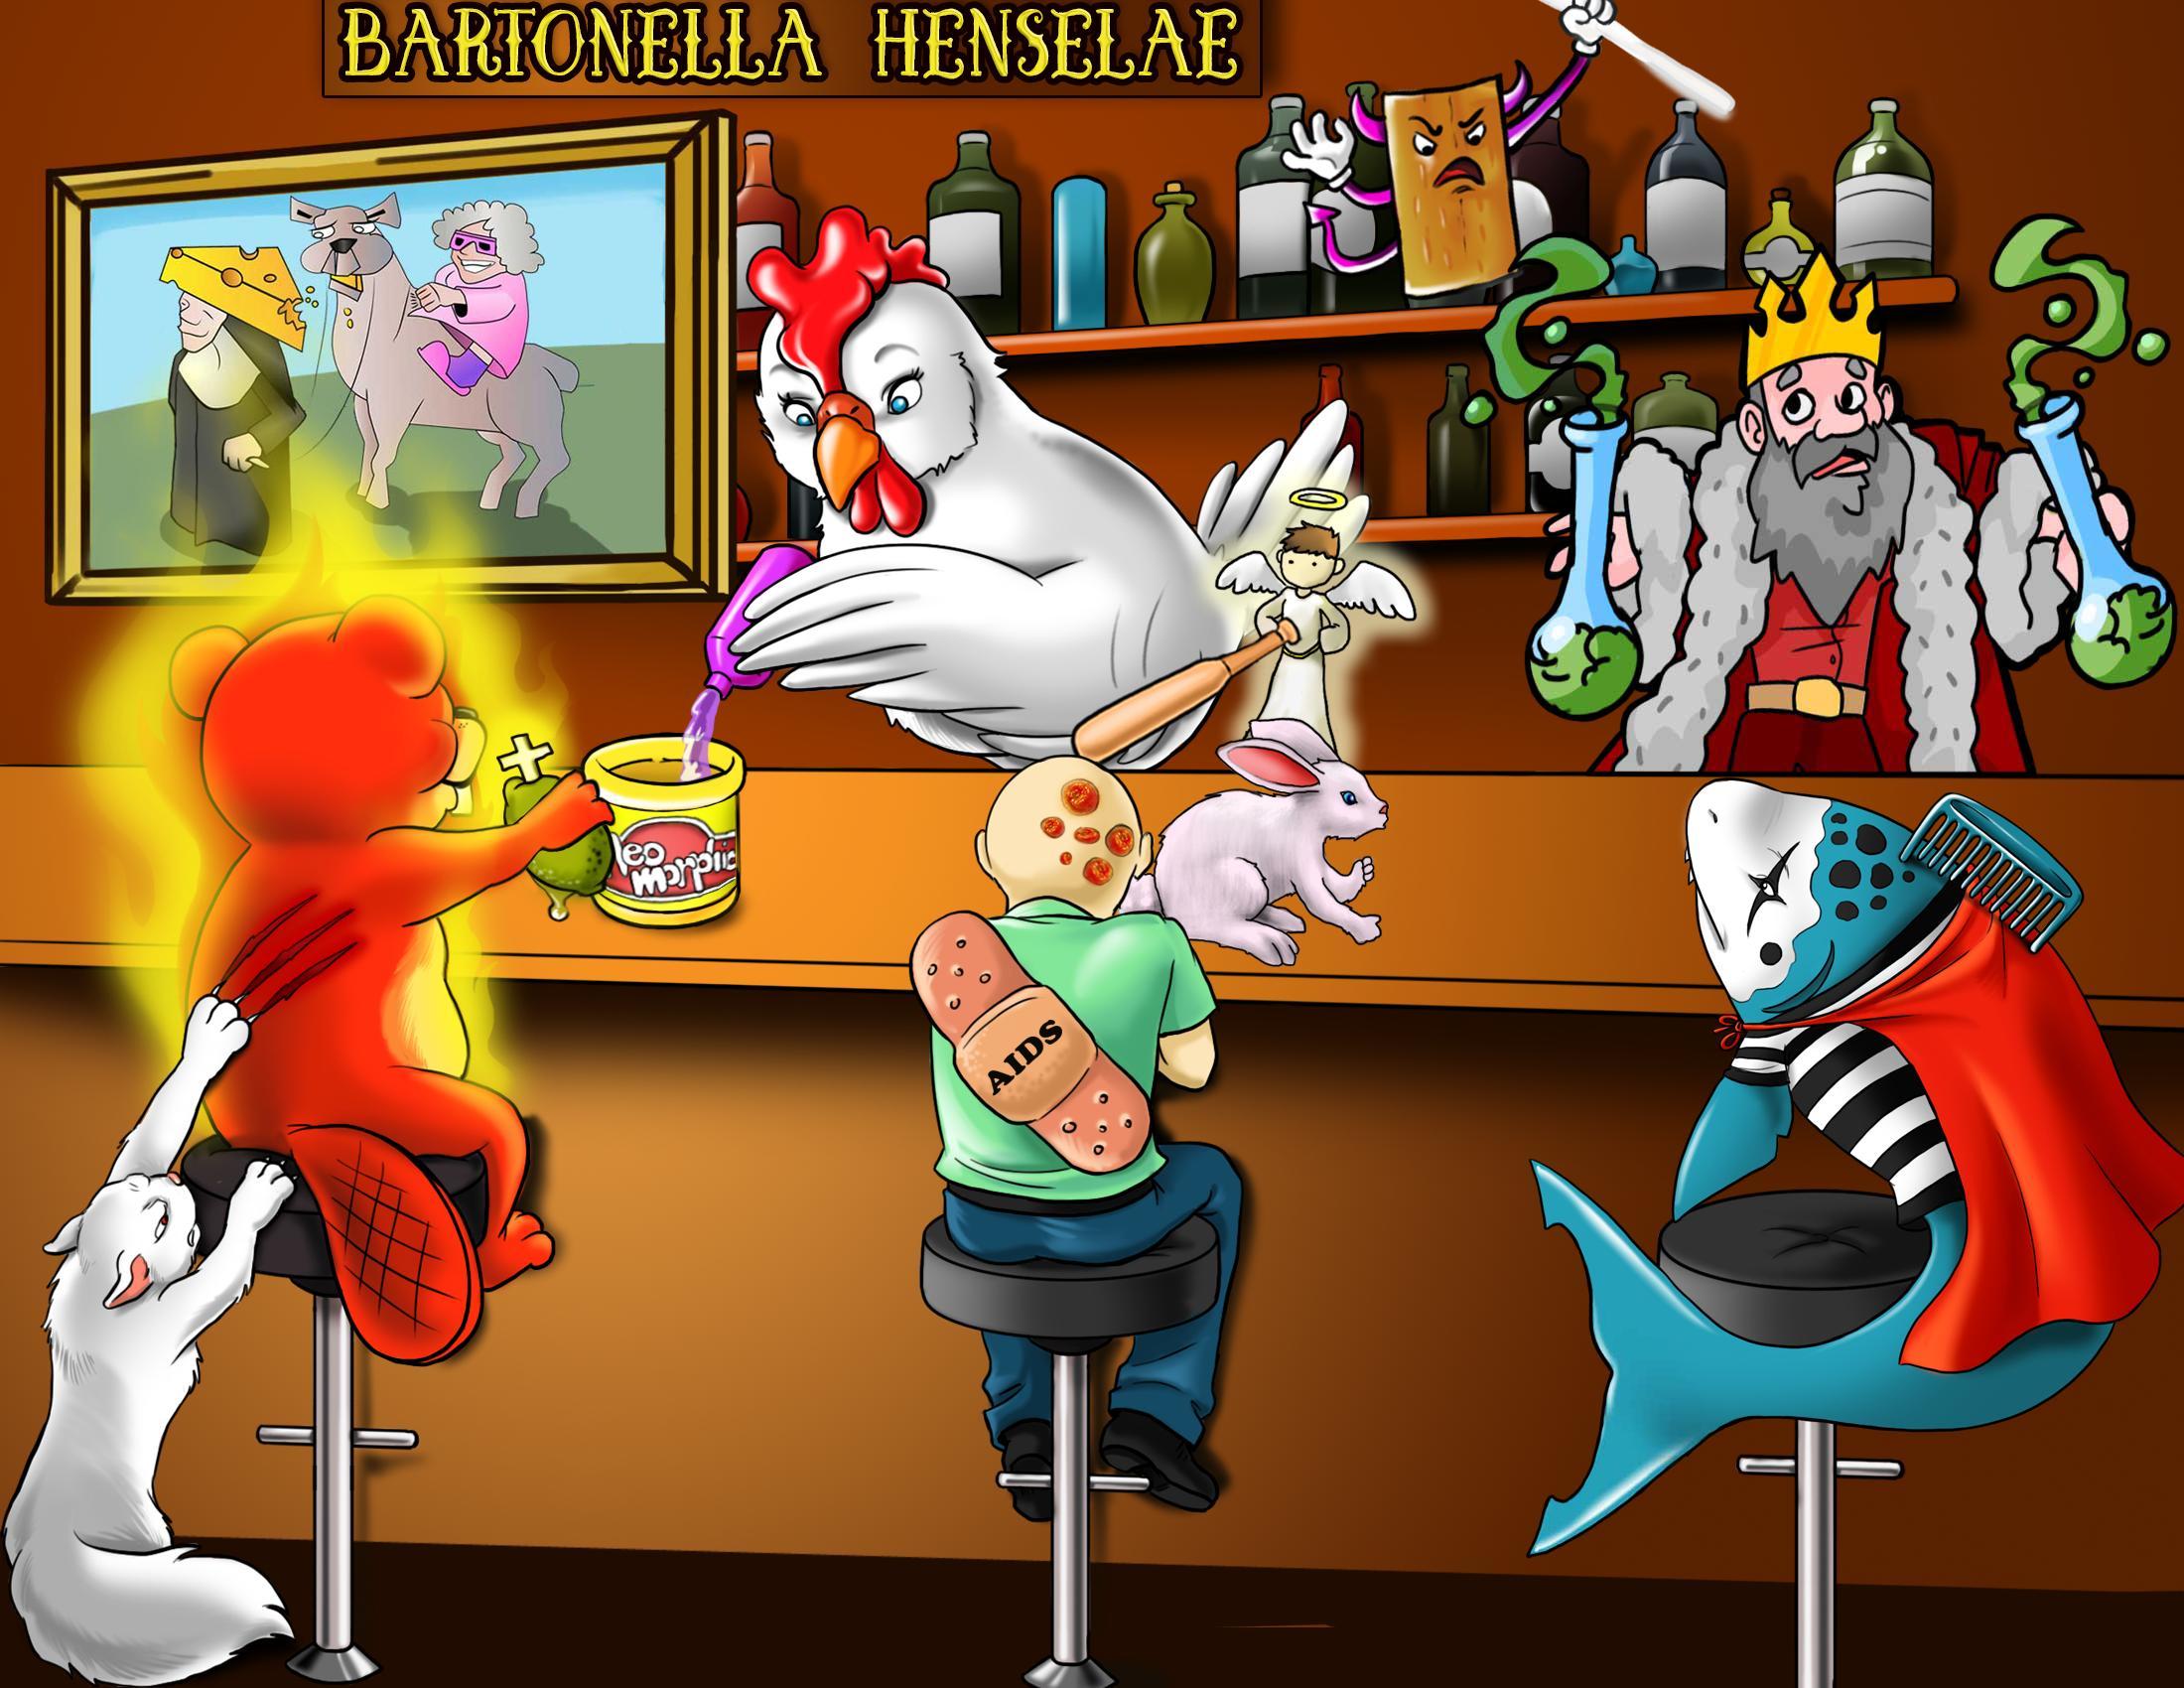 Bartonella henselae